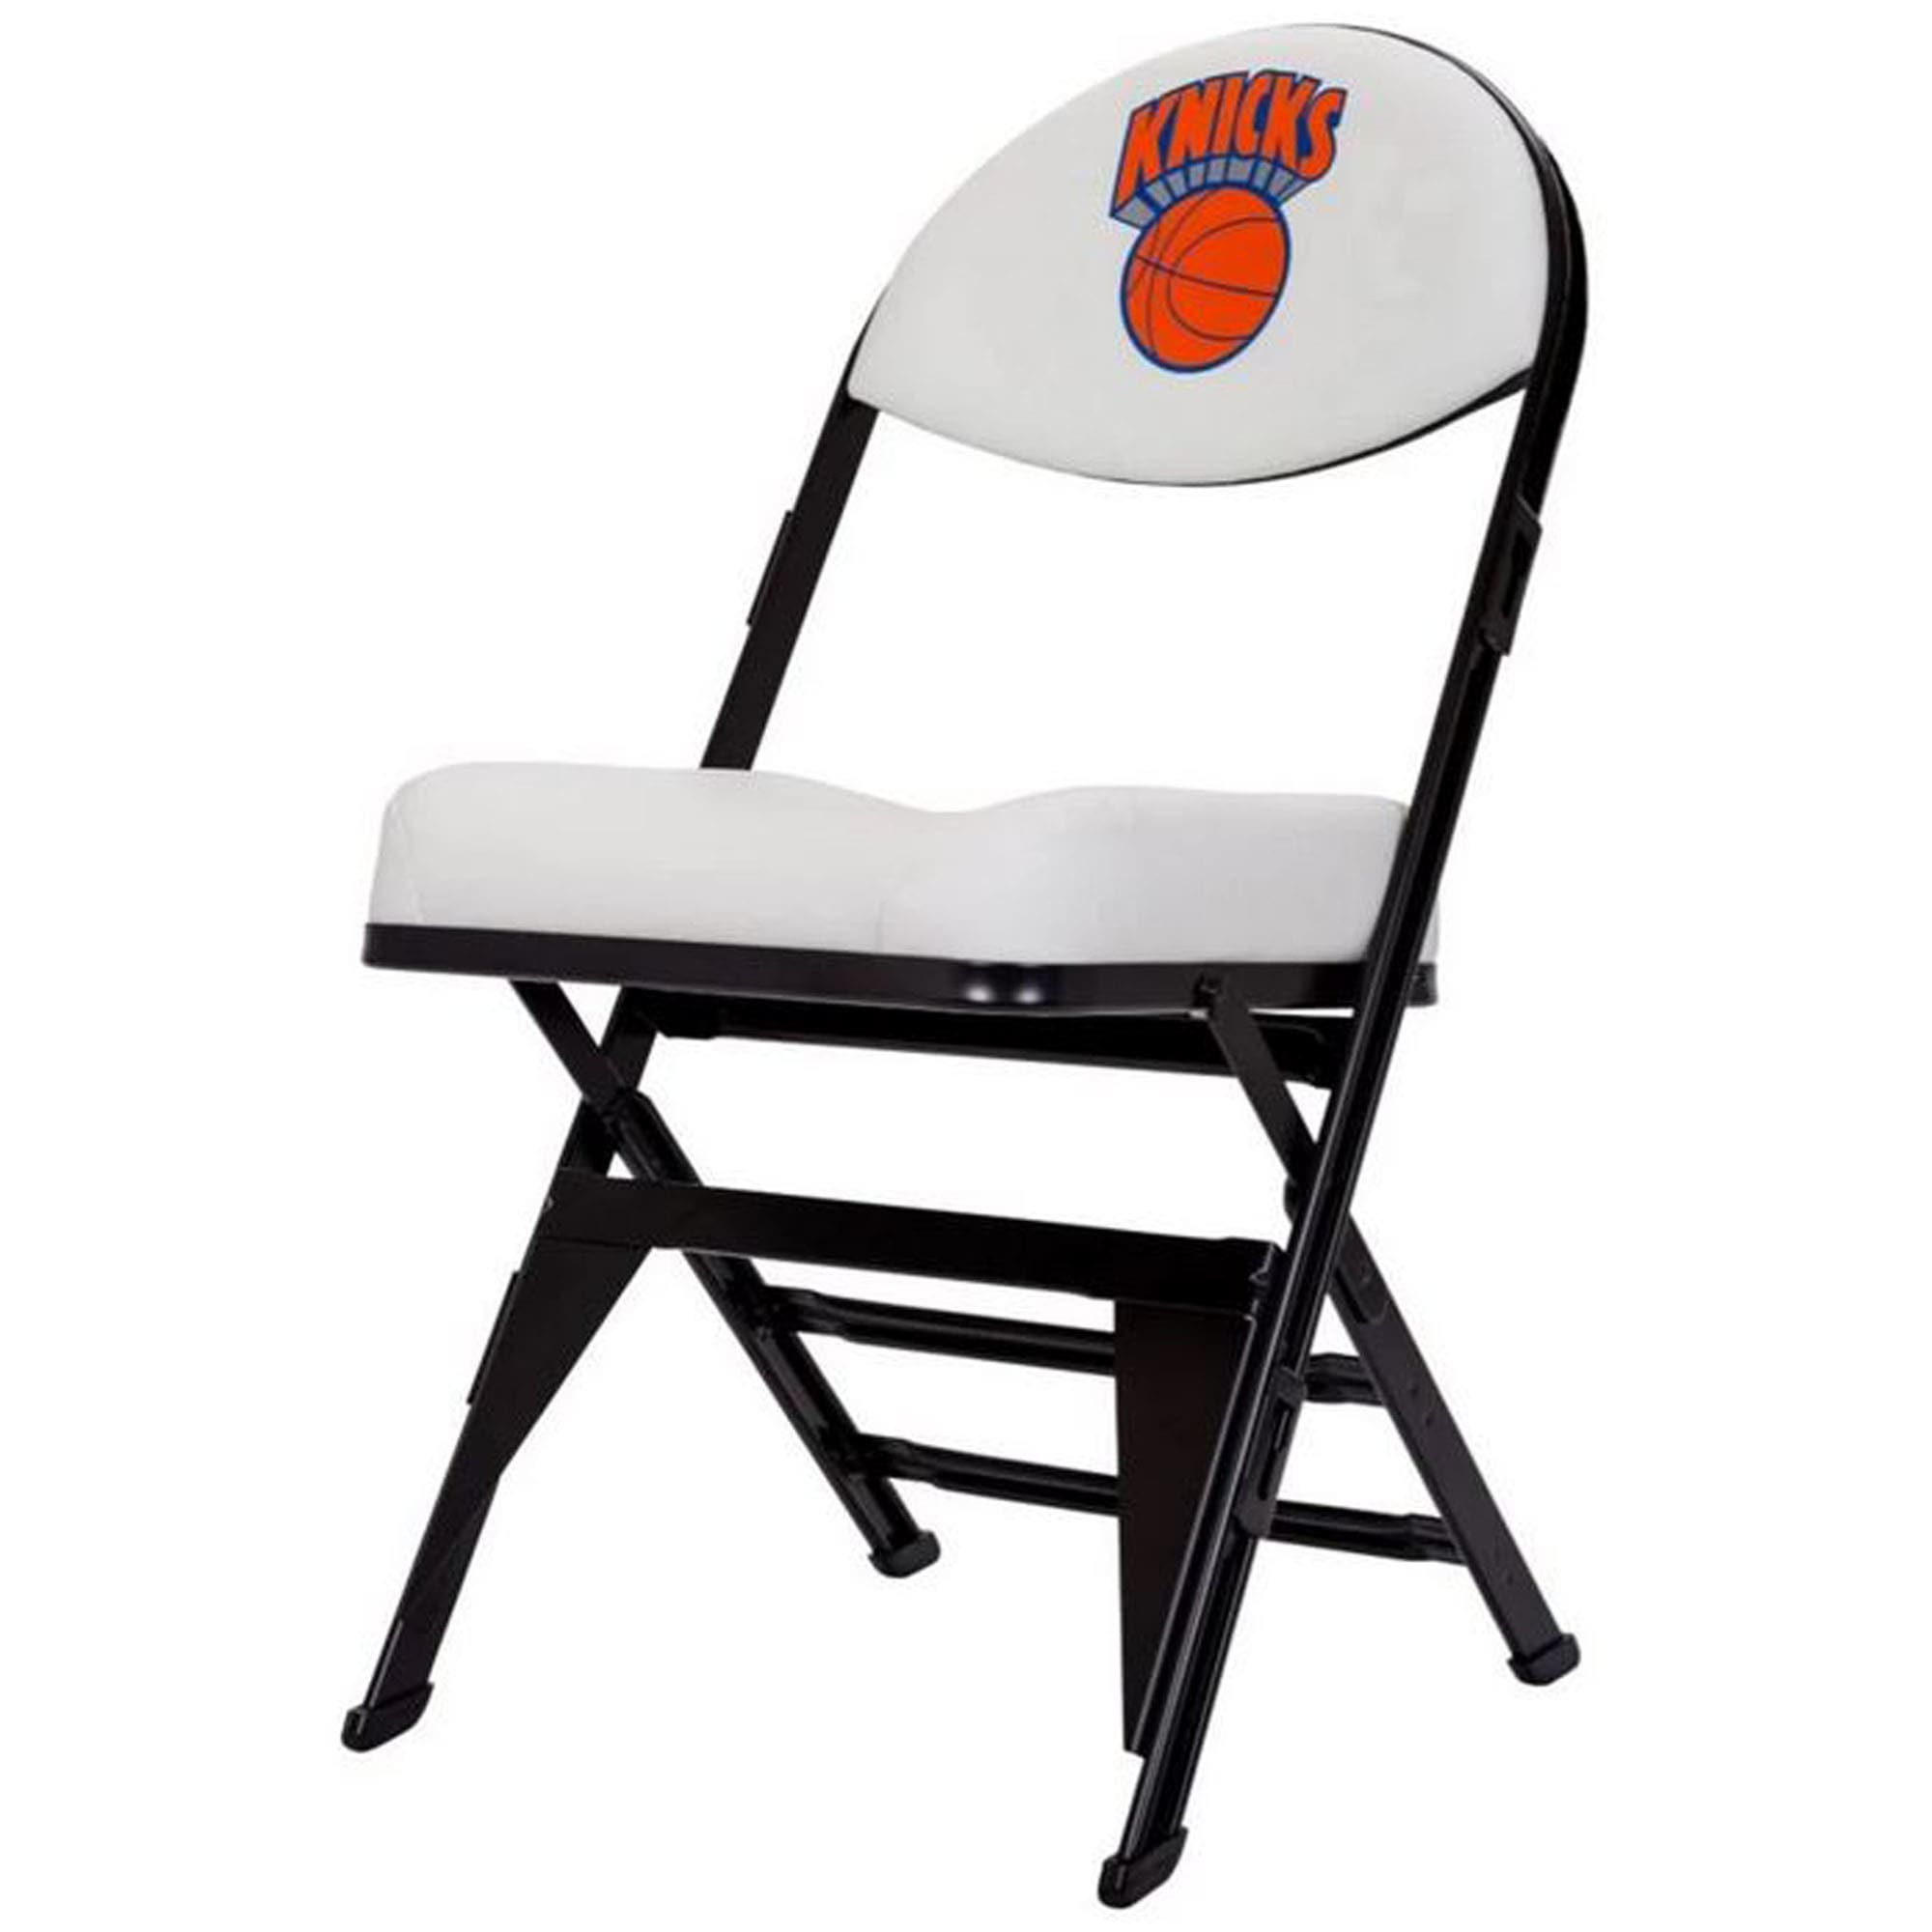 New York Knicks Retro Chair - White